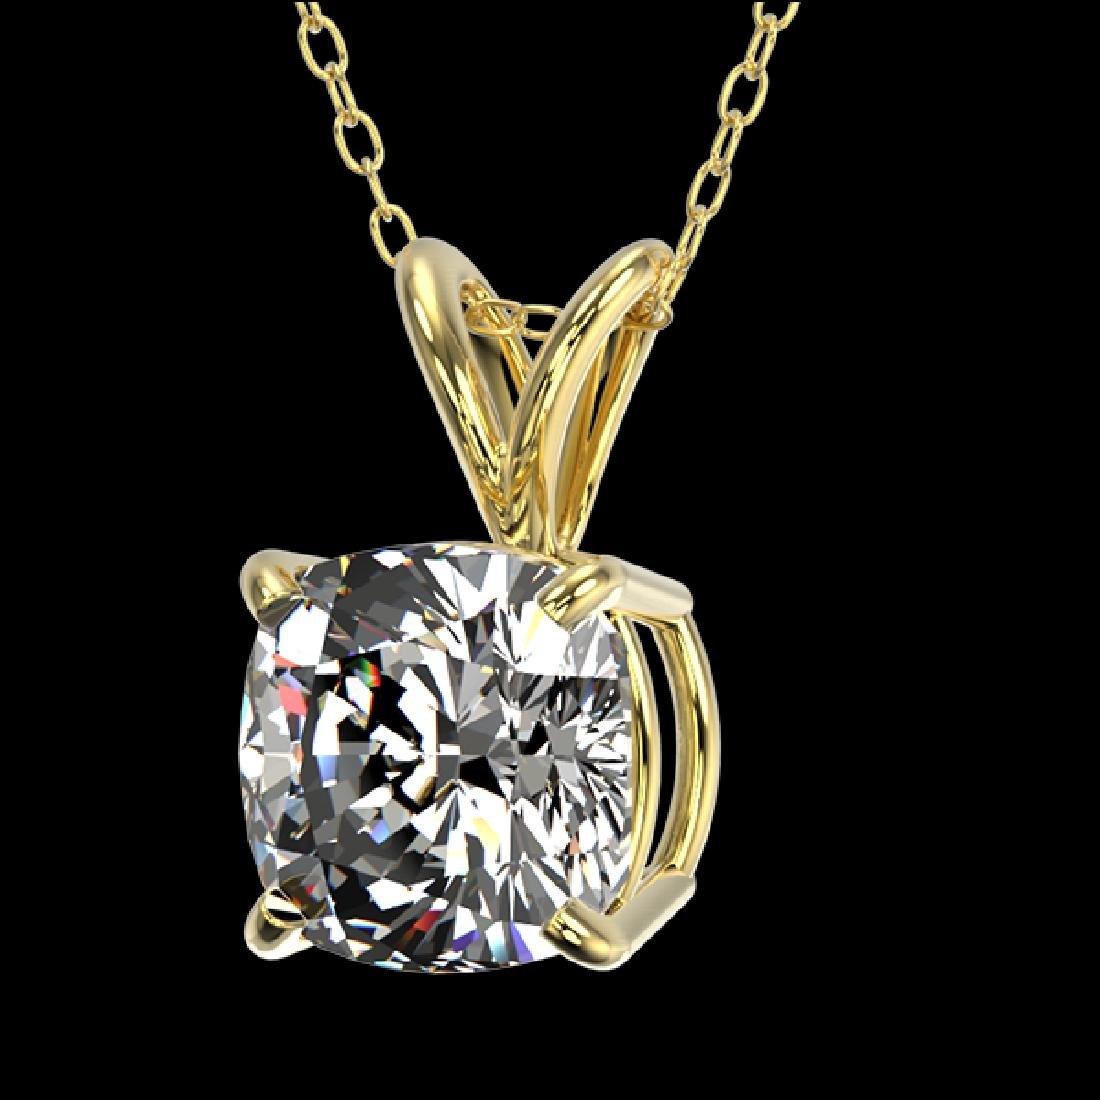 1 CTW Certified VS/SI Quality Cushion Cut Diamond - 2